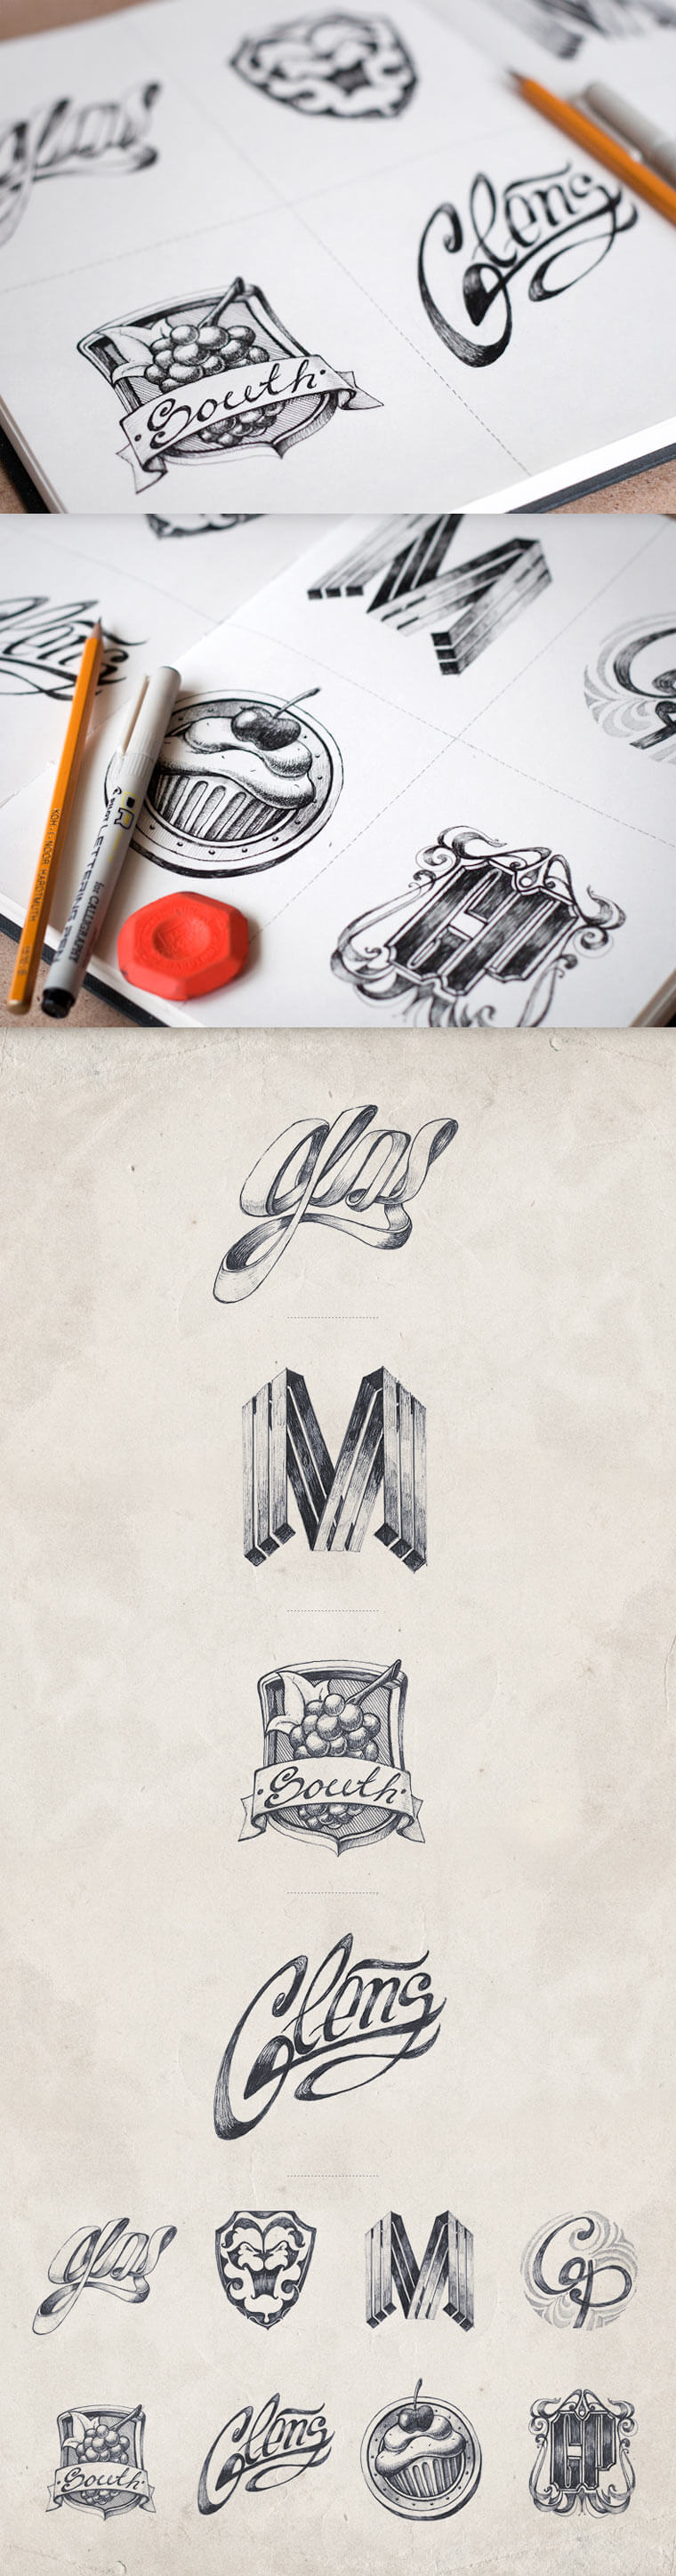 20 gezeichnete Logoskizzen logoskizzen_04